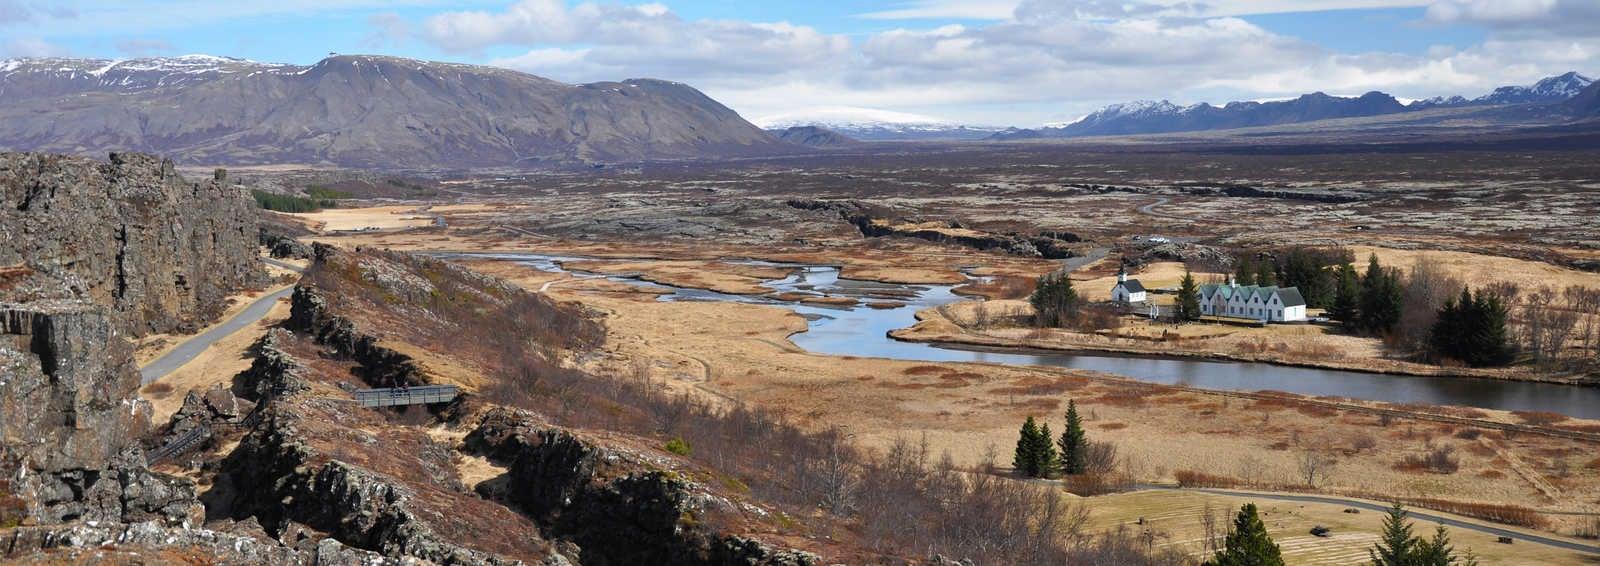 The rift valley at Thingvellir N.P, Rift Vally